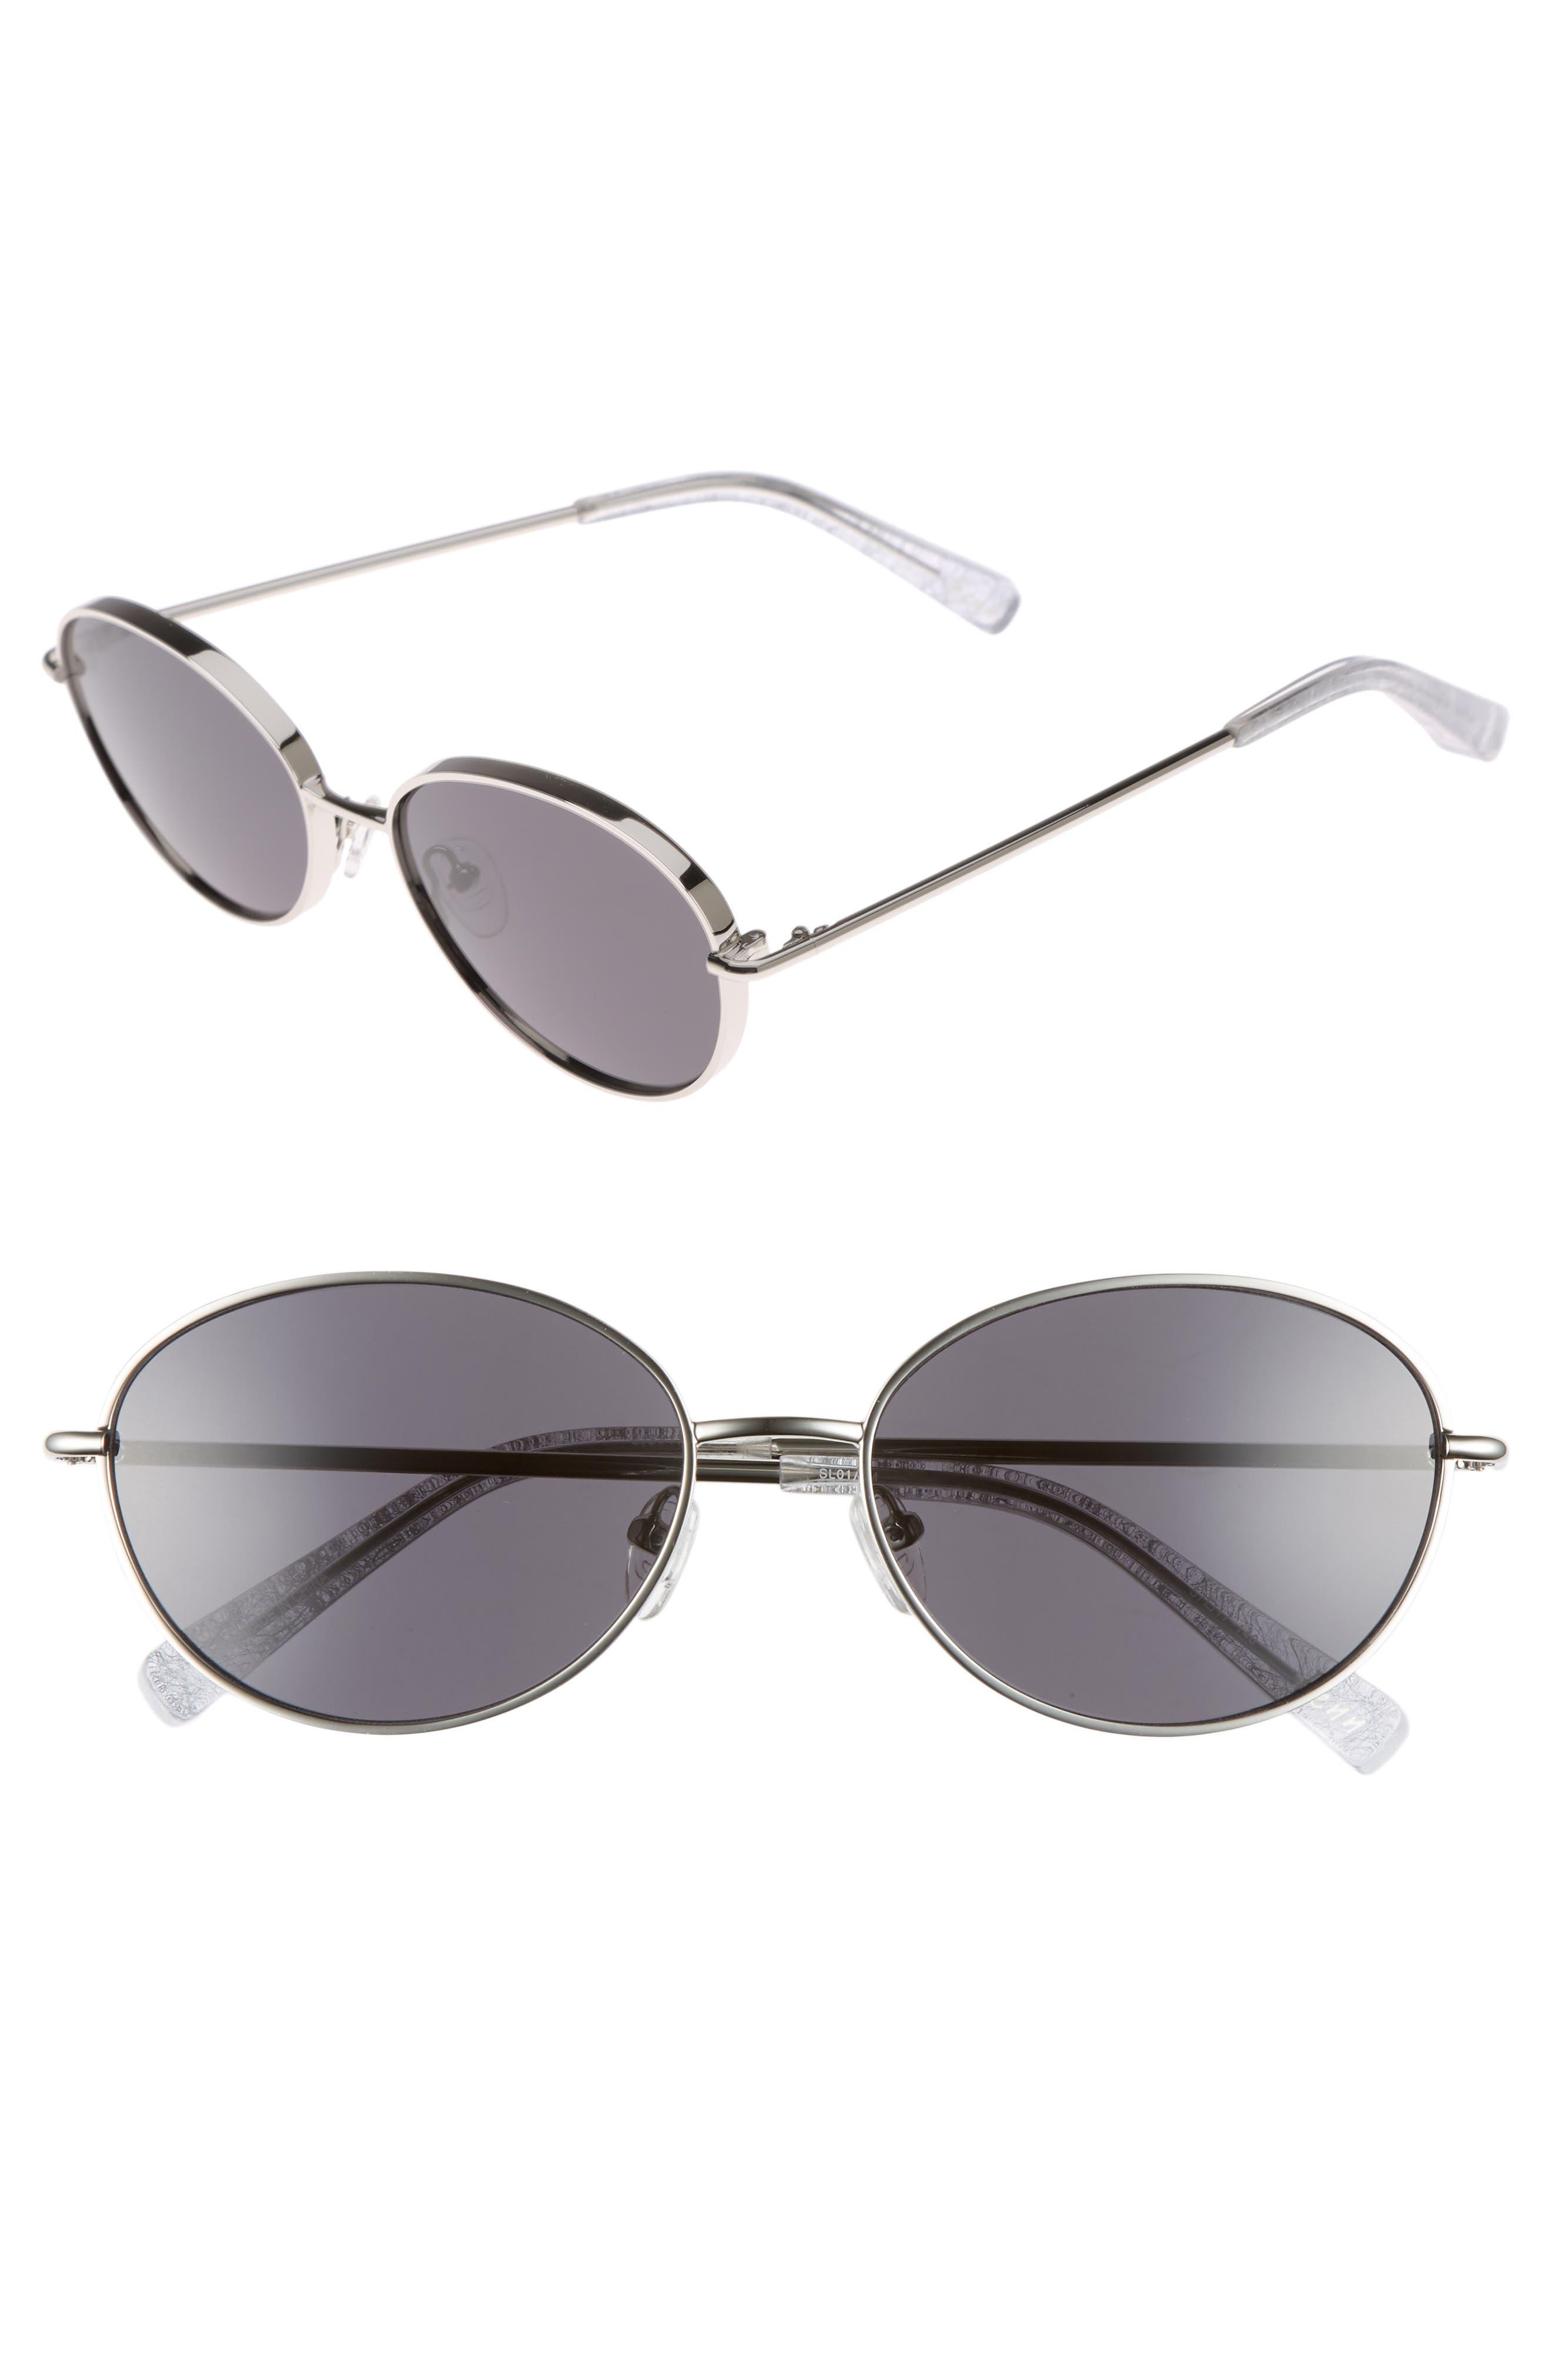 Alternate Image 1 Selected - Elizabeth and James Fenn 57mm Oval Sunglasses